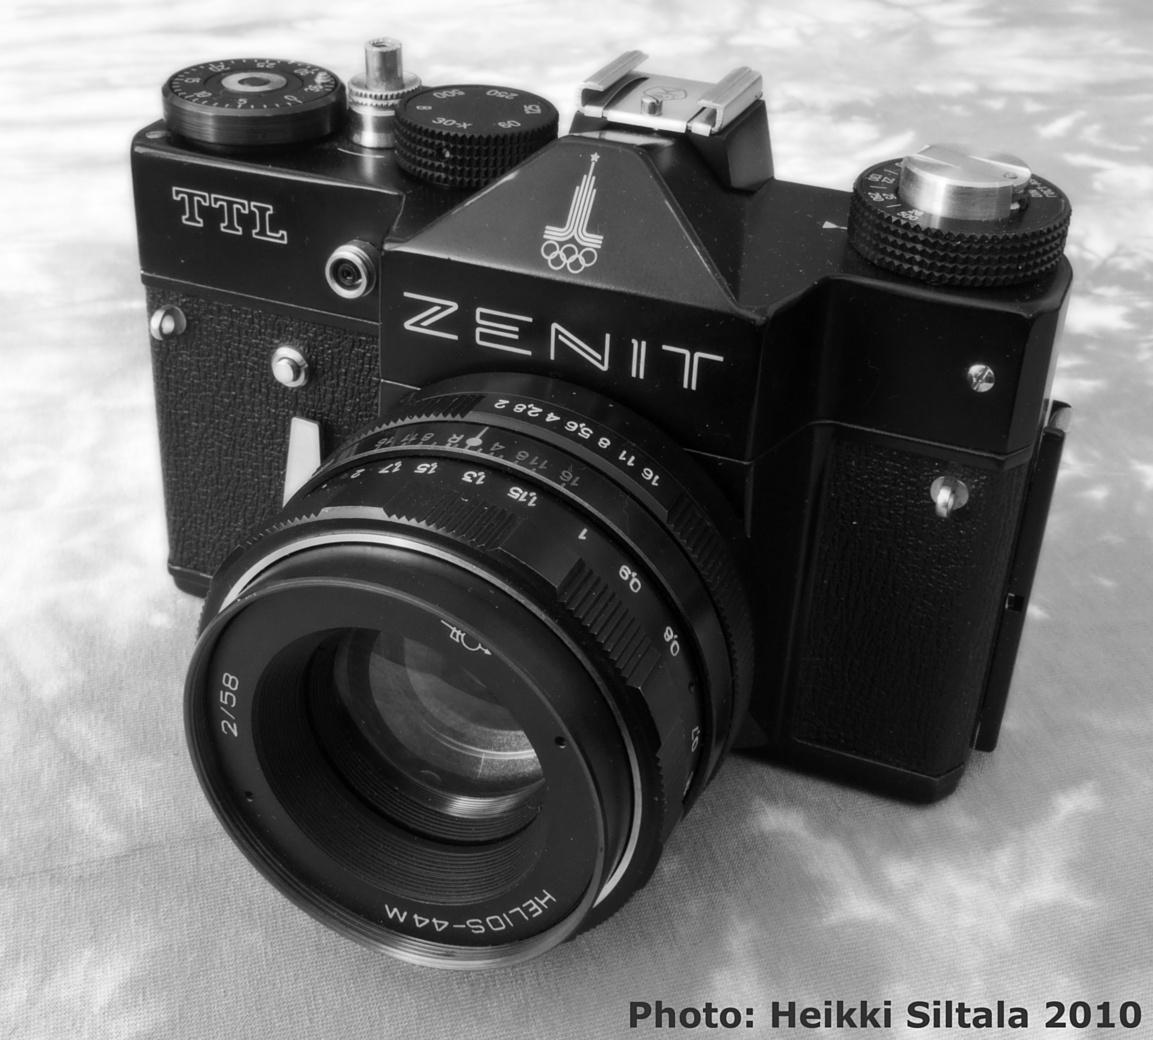 Bonus photo 9/9: my complete set of Zenit Olympics 1980 cameras, Zenit TTL black with the tower logo, photo 156180, 2010-07-31